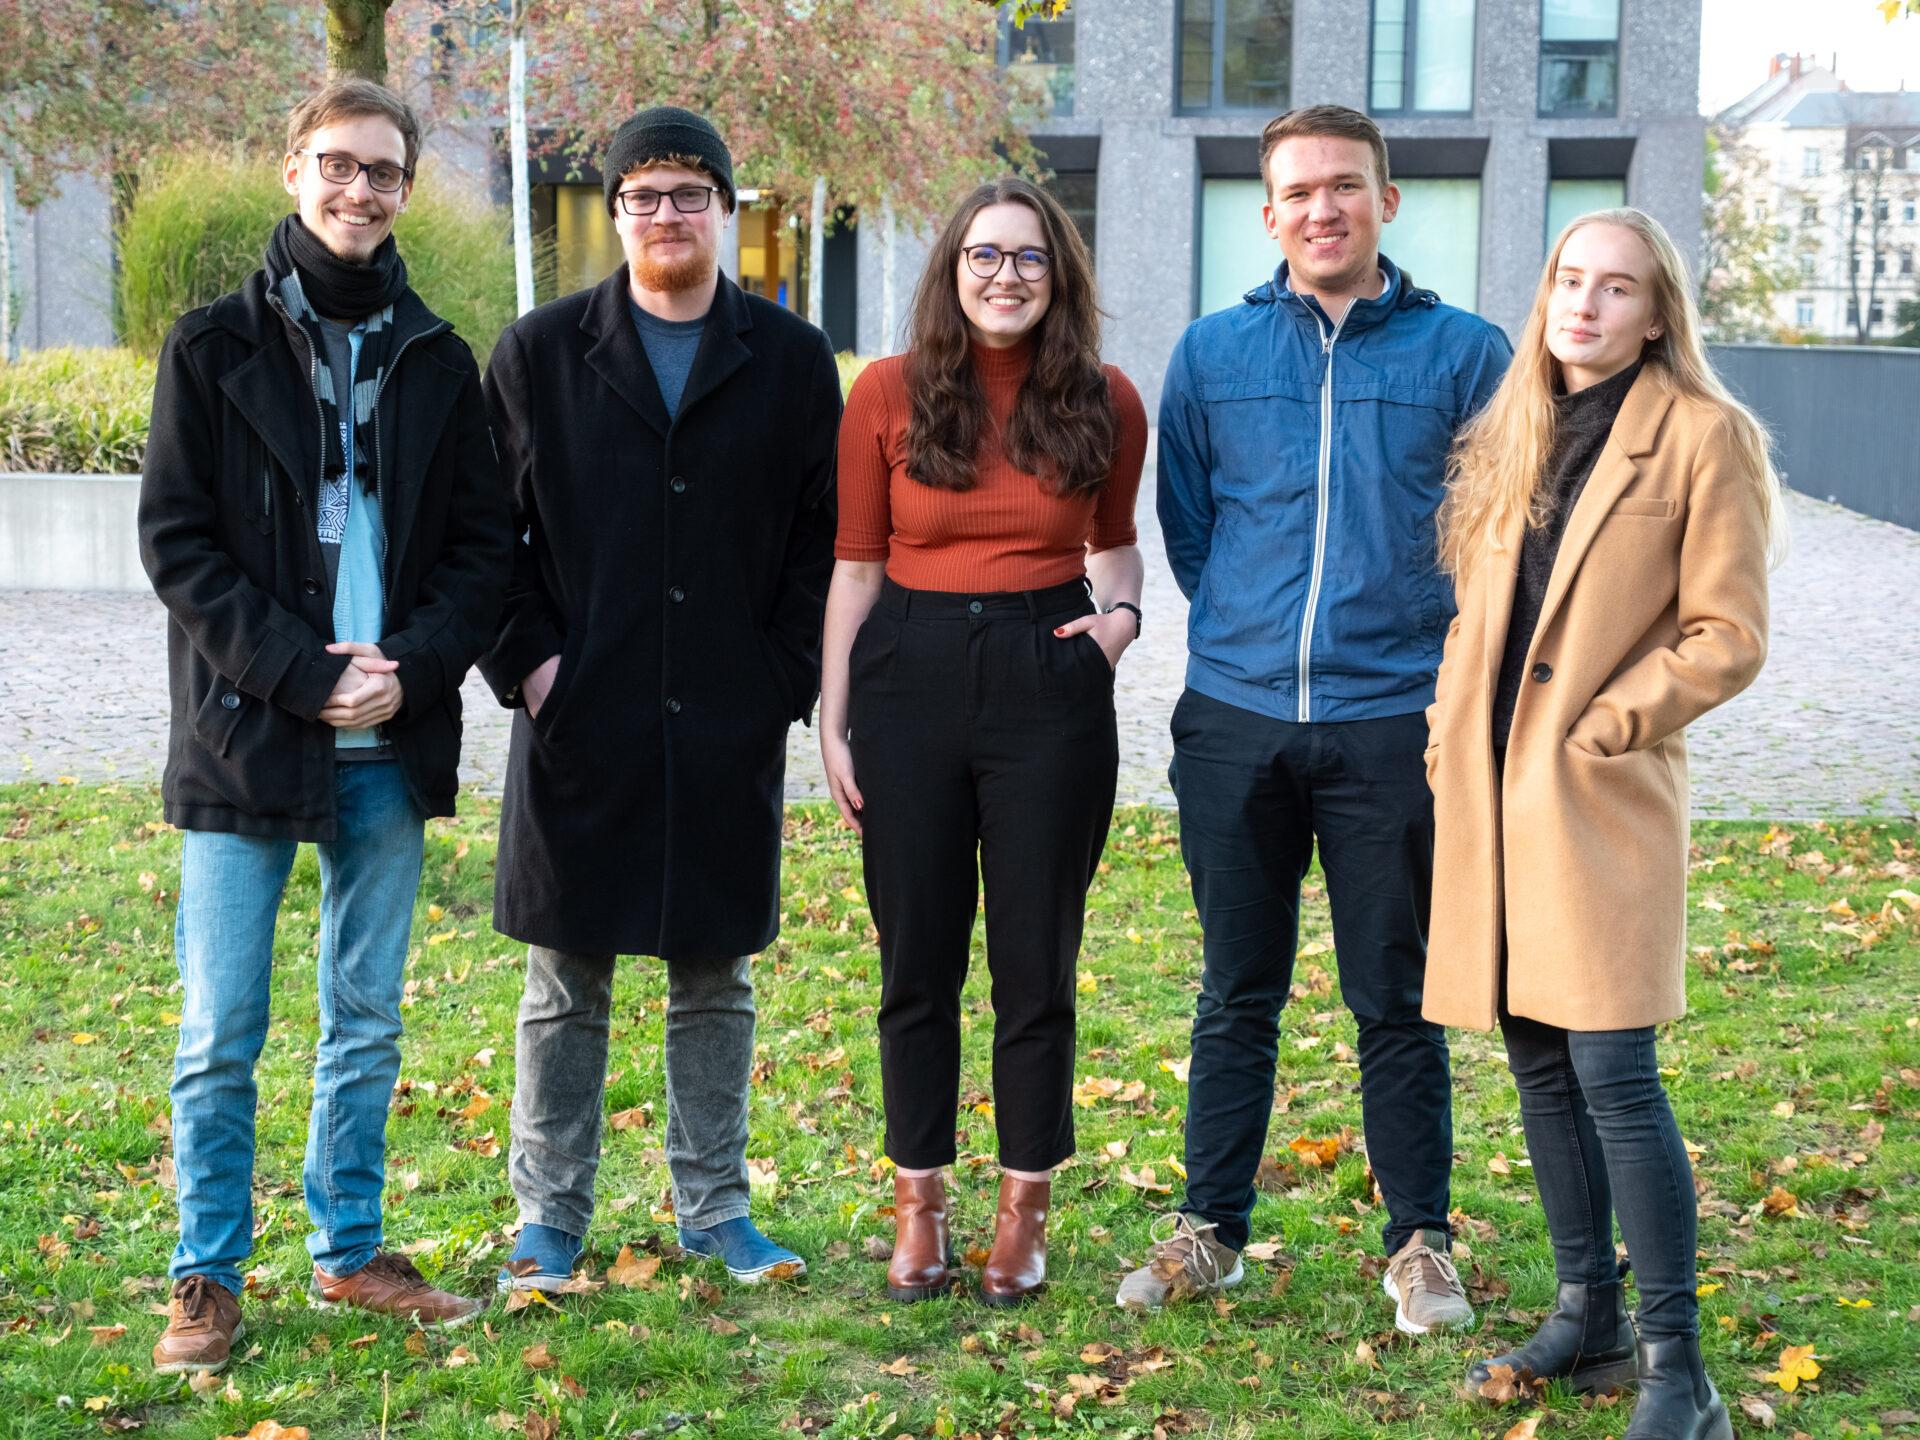 Das Team Social Media des Crossmedia- Teams der Hochschule Mittweida: Anja Weisbach, Franz Lermer, Jonas Dorn, Julia Walter, Max Herrmann